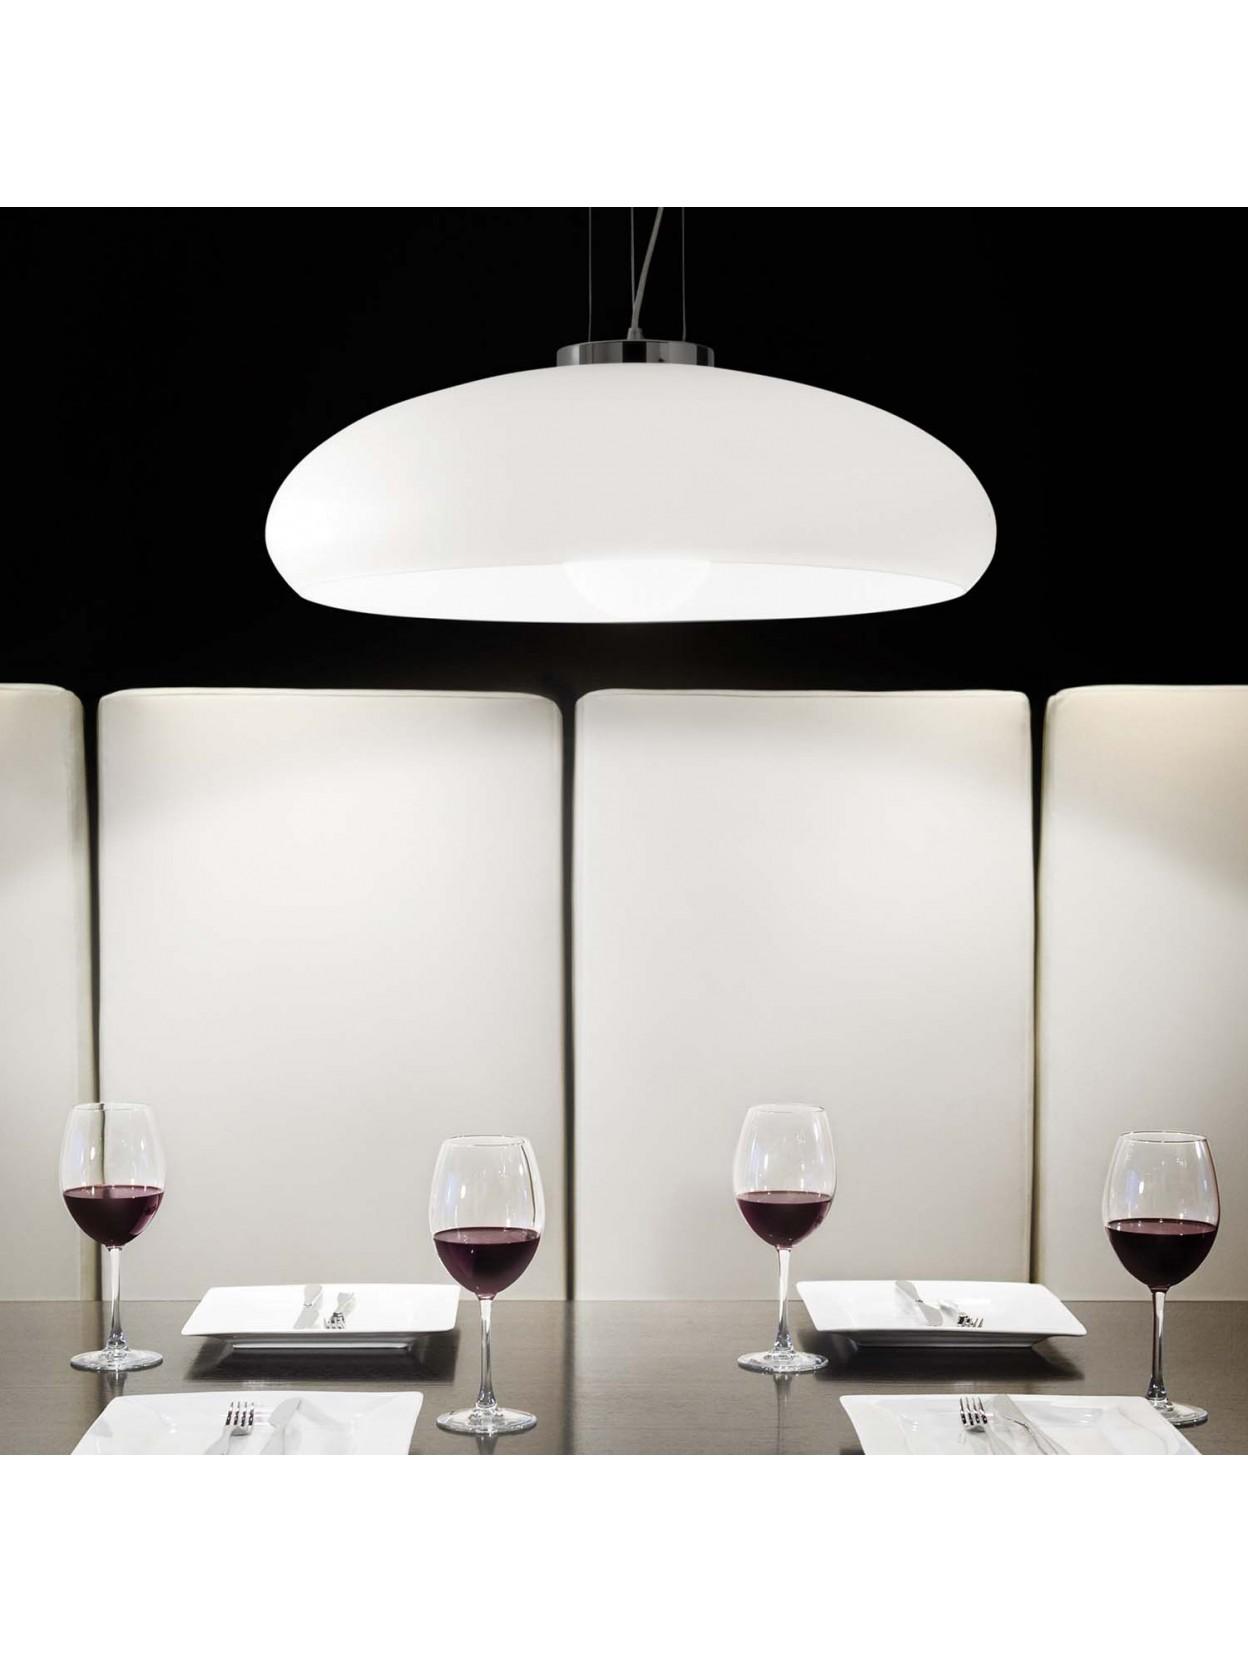 Lampade Da Tavolo Moderne Acciaio : Lampadario moderno in vetro bianco luce d aria